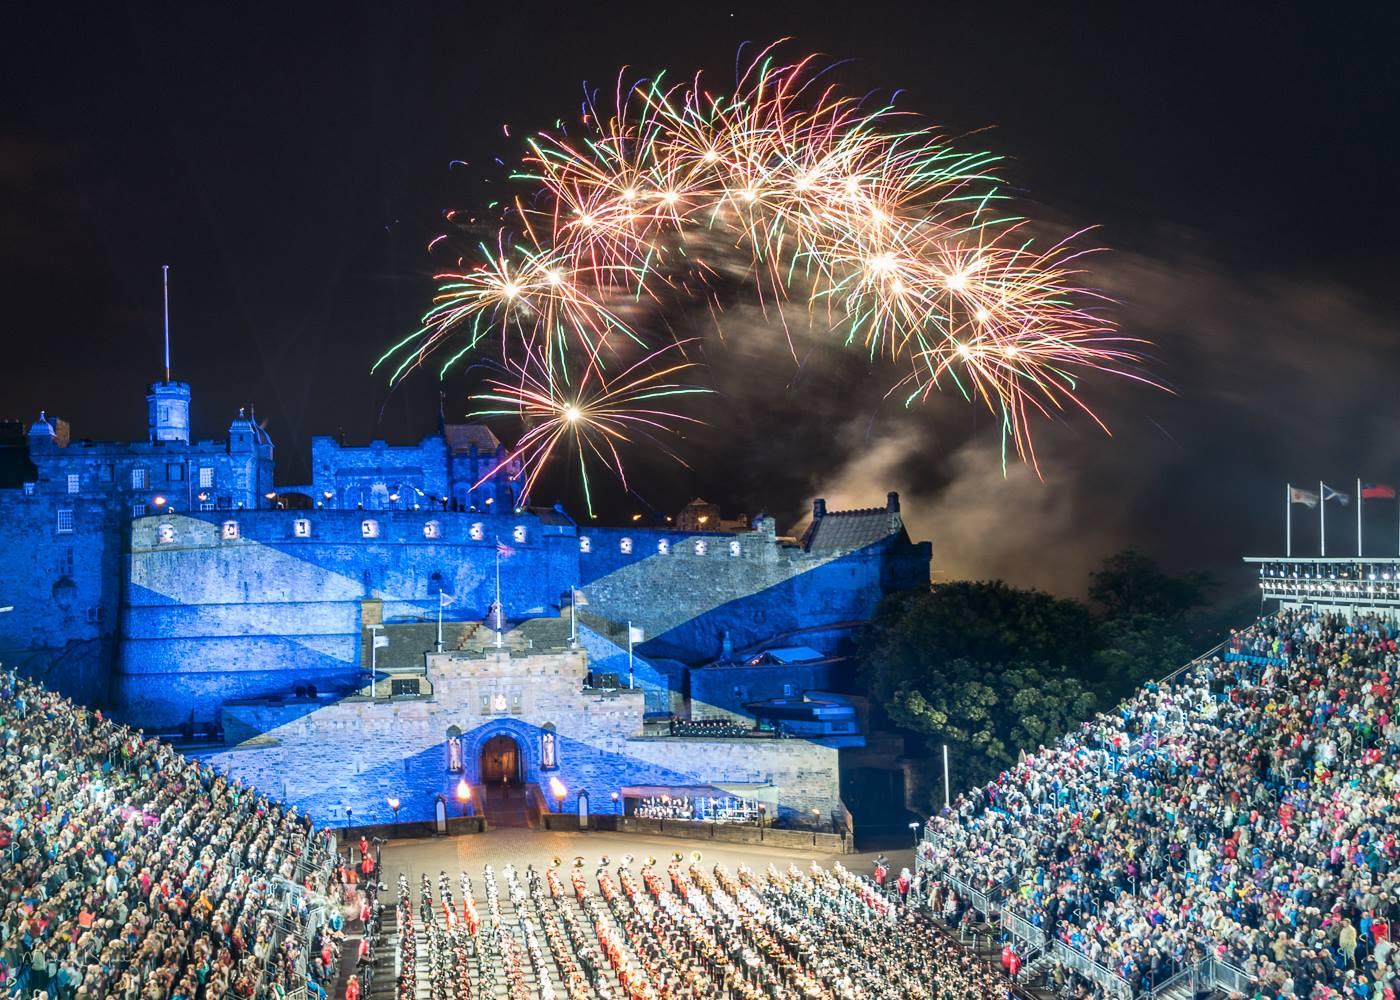 Edinburgh photos the royal edinburgh military tattoo for Tattoo edinburgh scotland